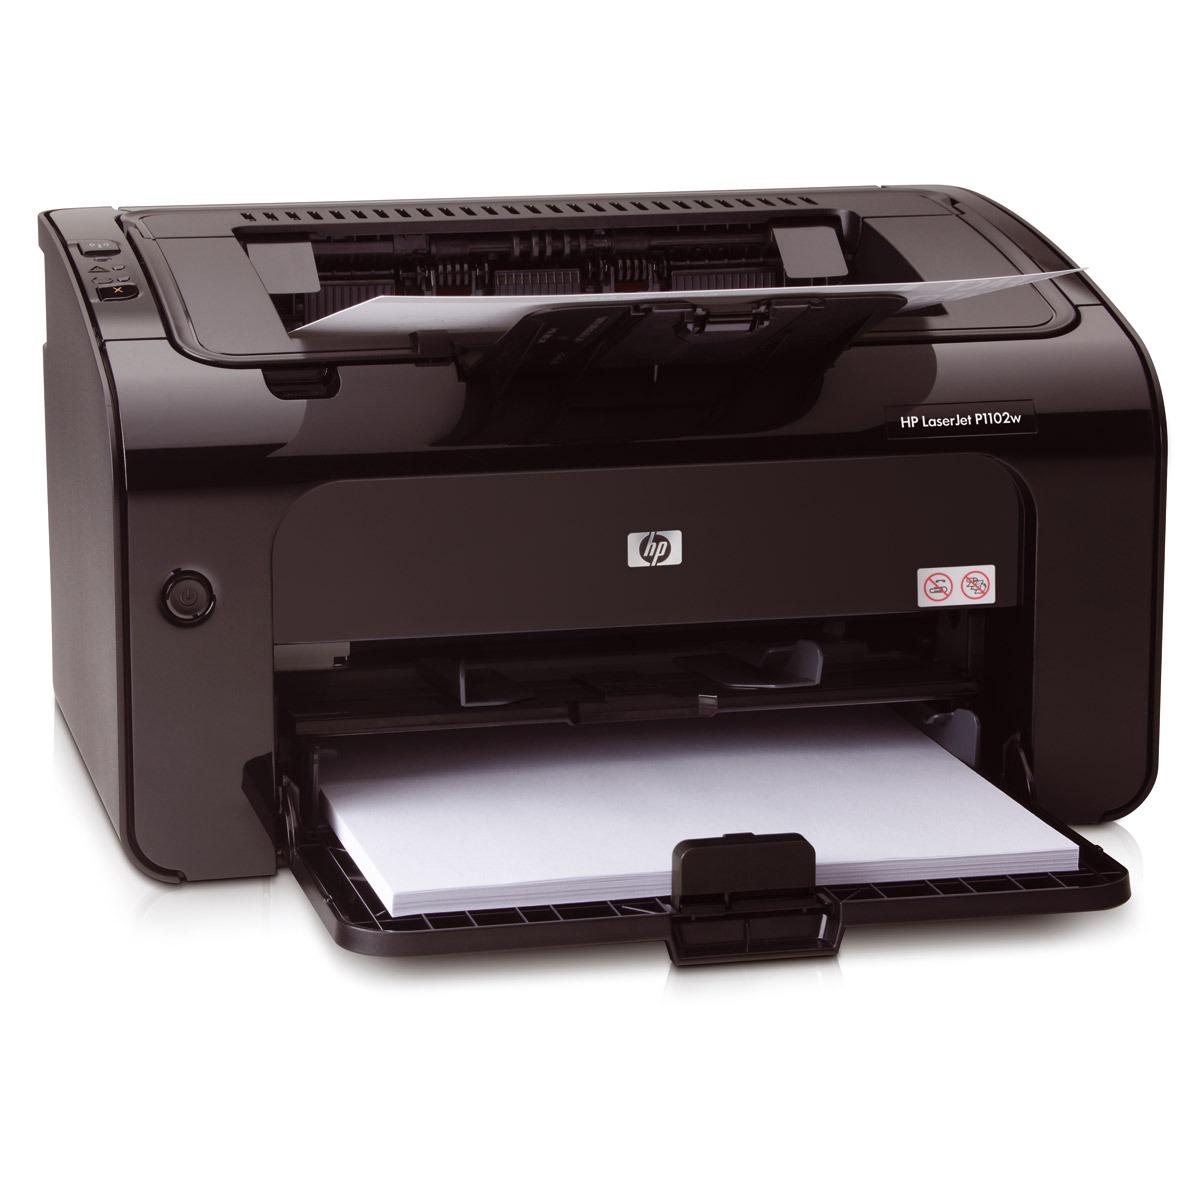 Imprimante laser HP LaserJet P1102w HP LaserJet P1102w - Imprimante laser monochrome (USB 2.0 / Wi-Fi B/G)